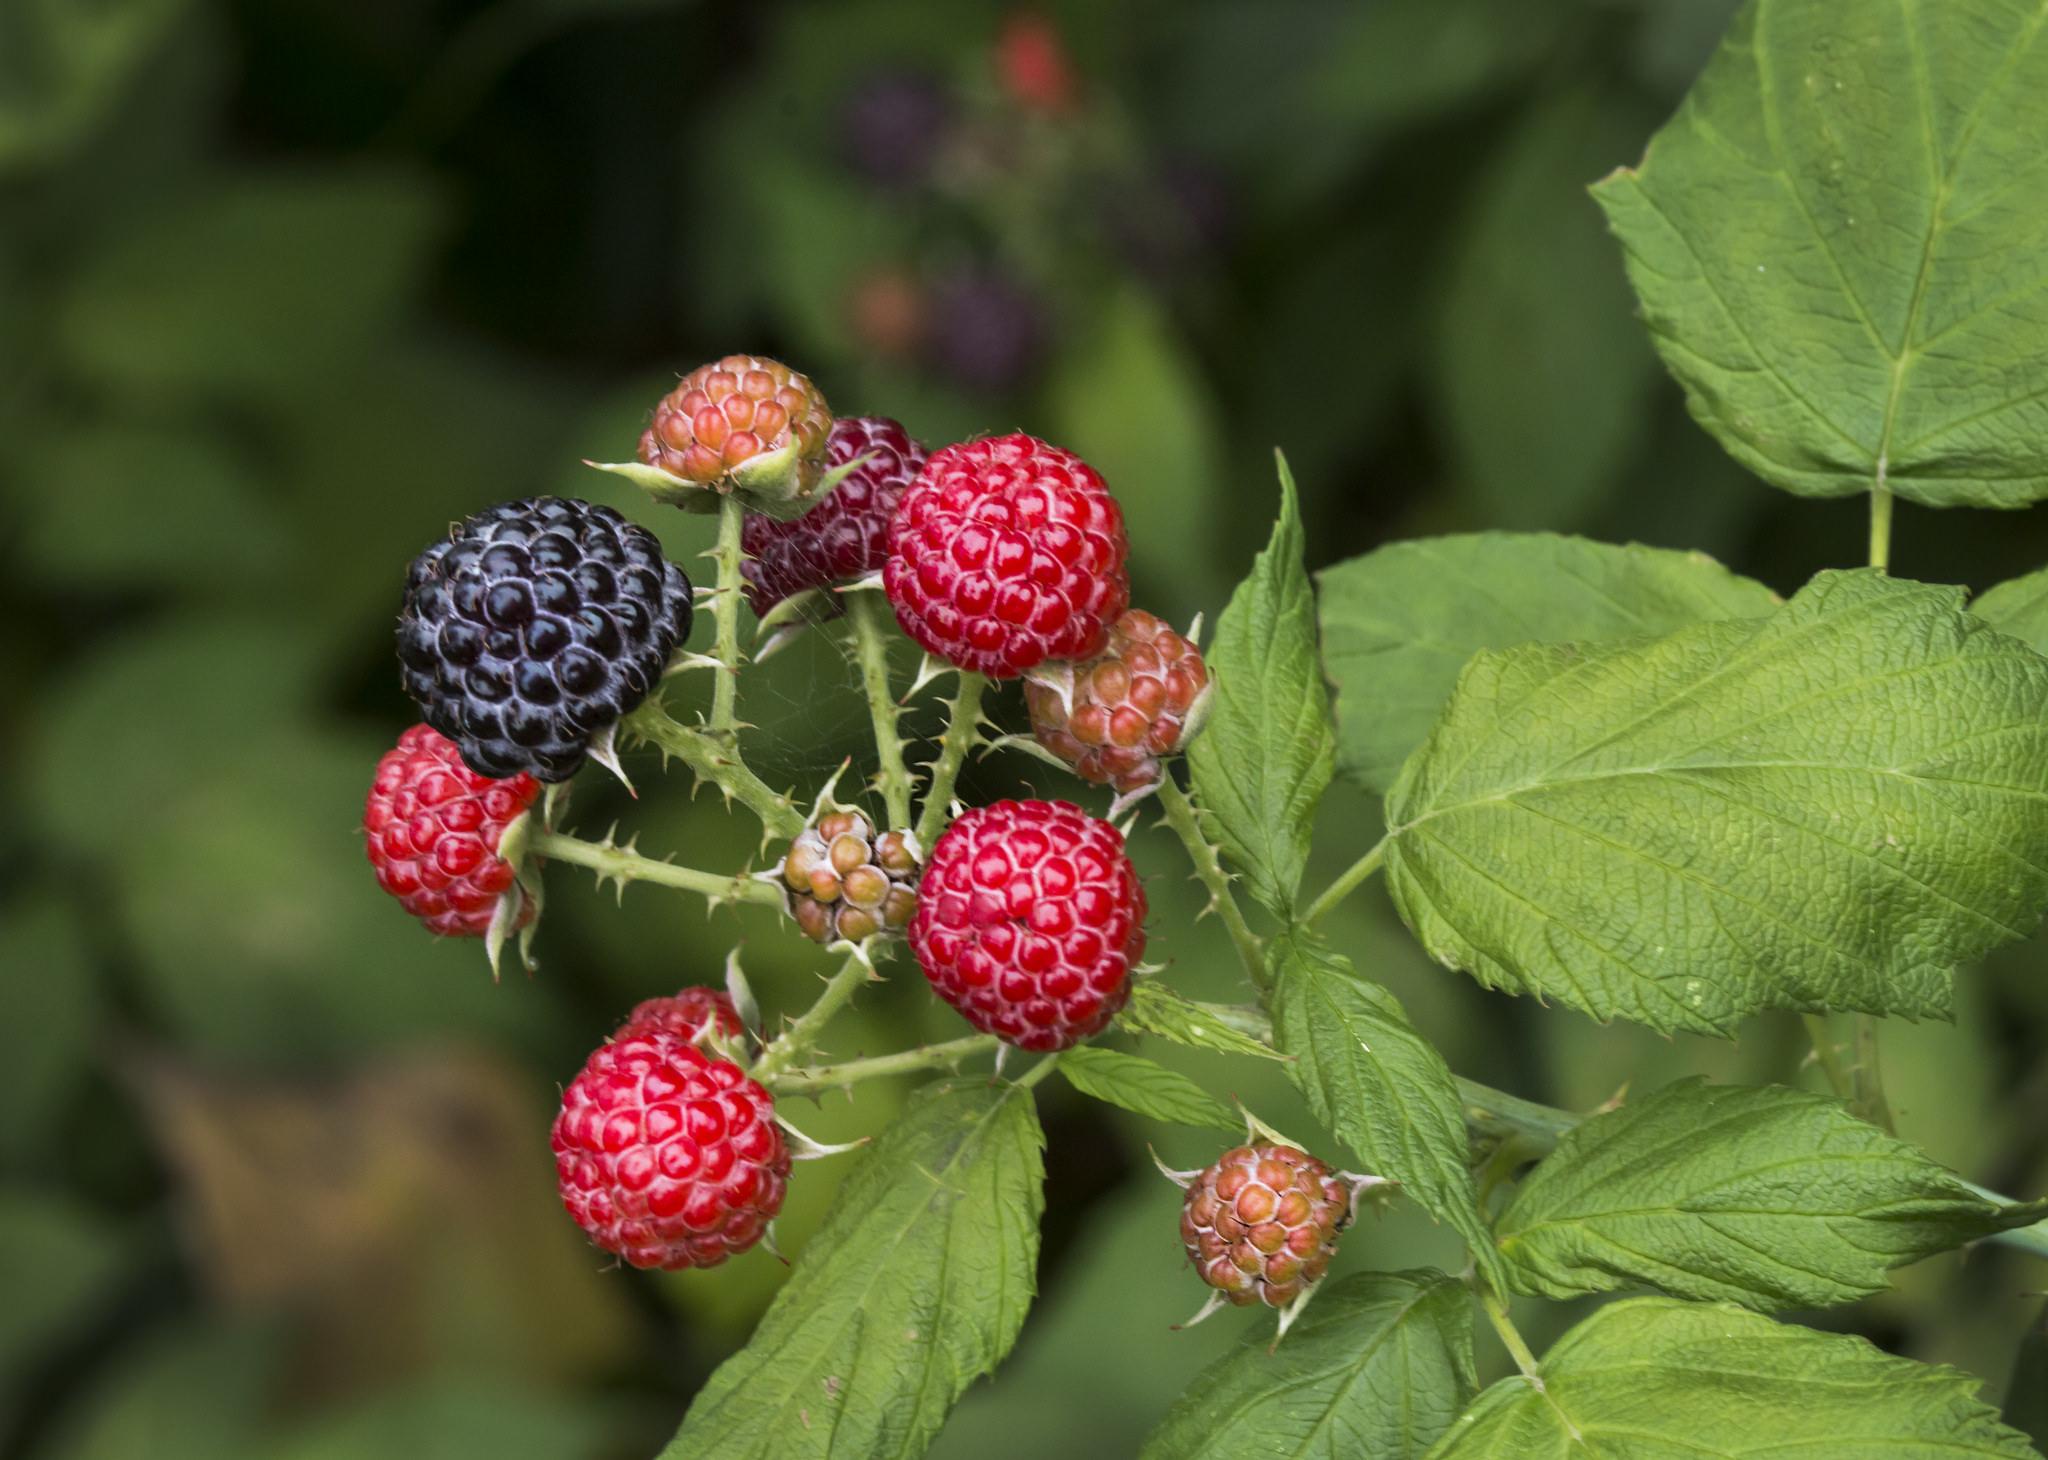 wild-berries-by-liz-west-on-flickr-creat